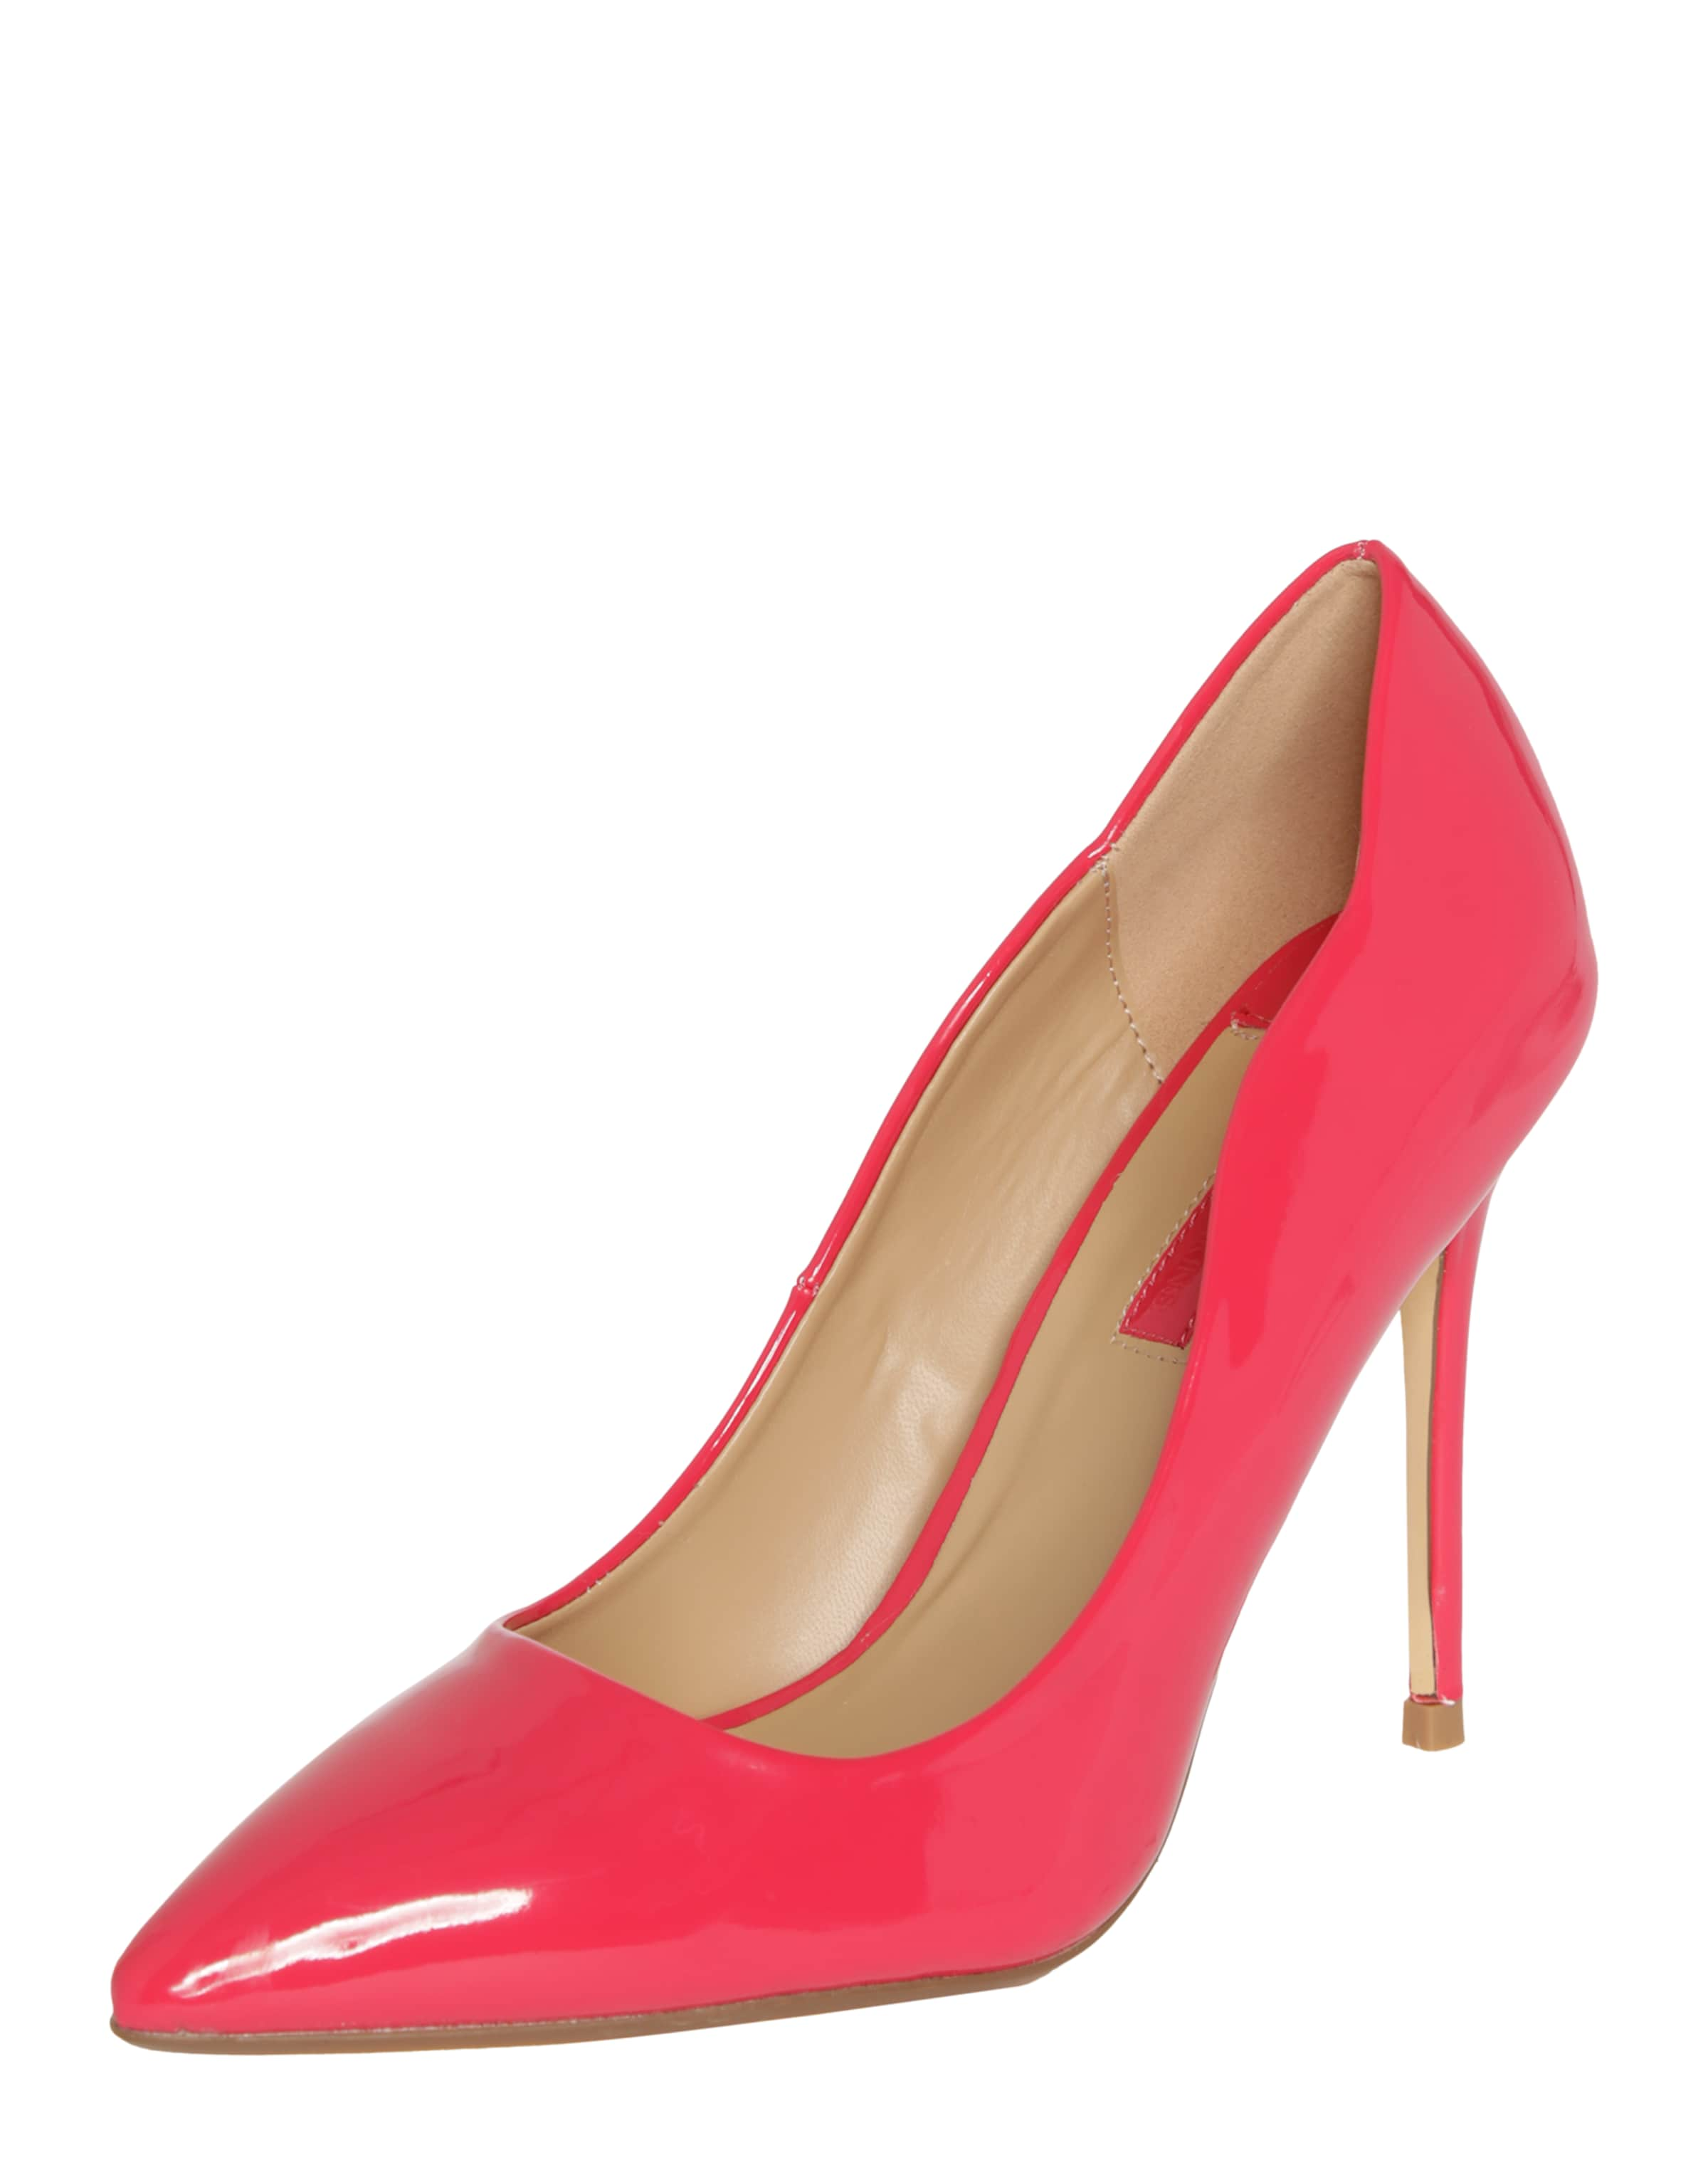 Haltbare Mode billige Schuhe Dorothy Perkins   Pumps 'Cynthia' Schuhe Gut getragene Schuhe